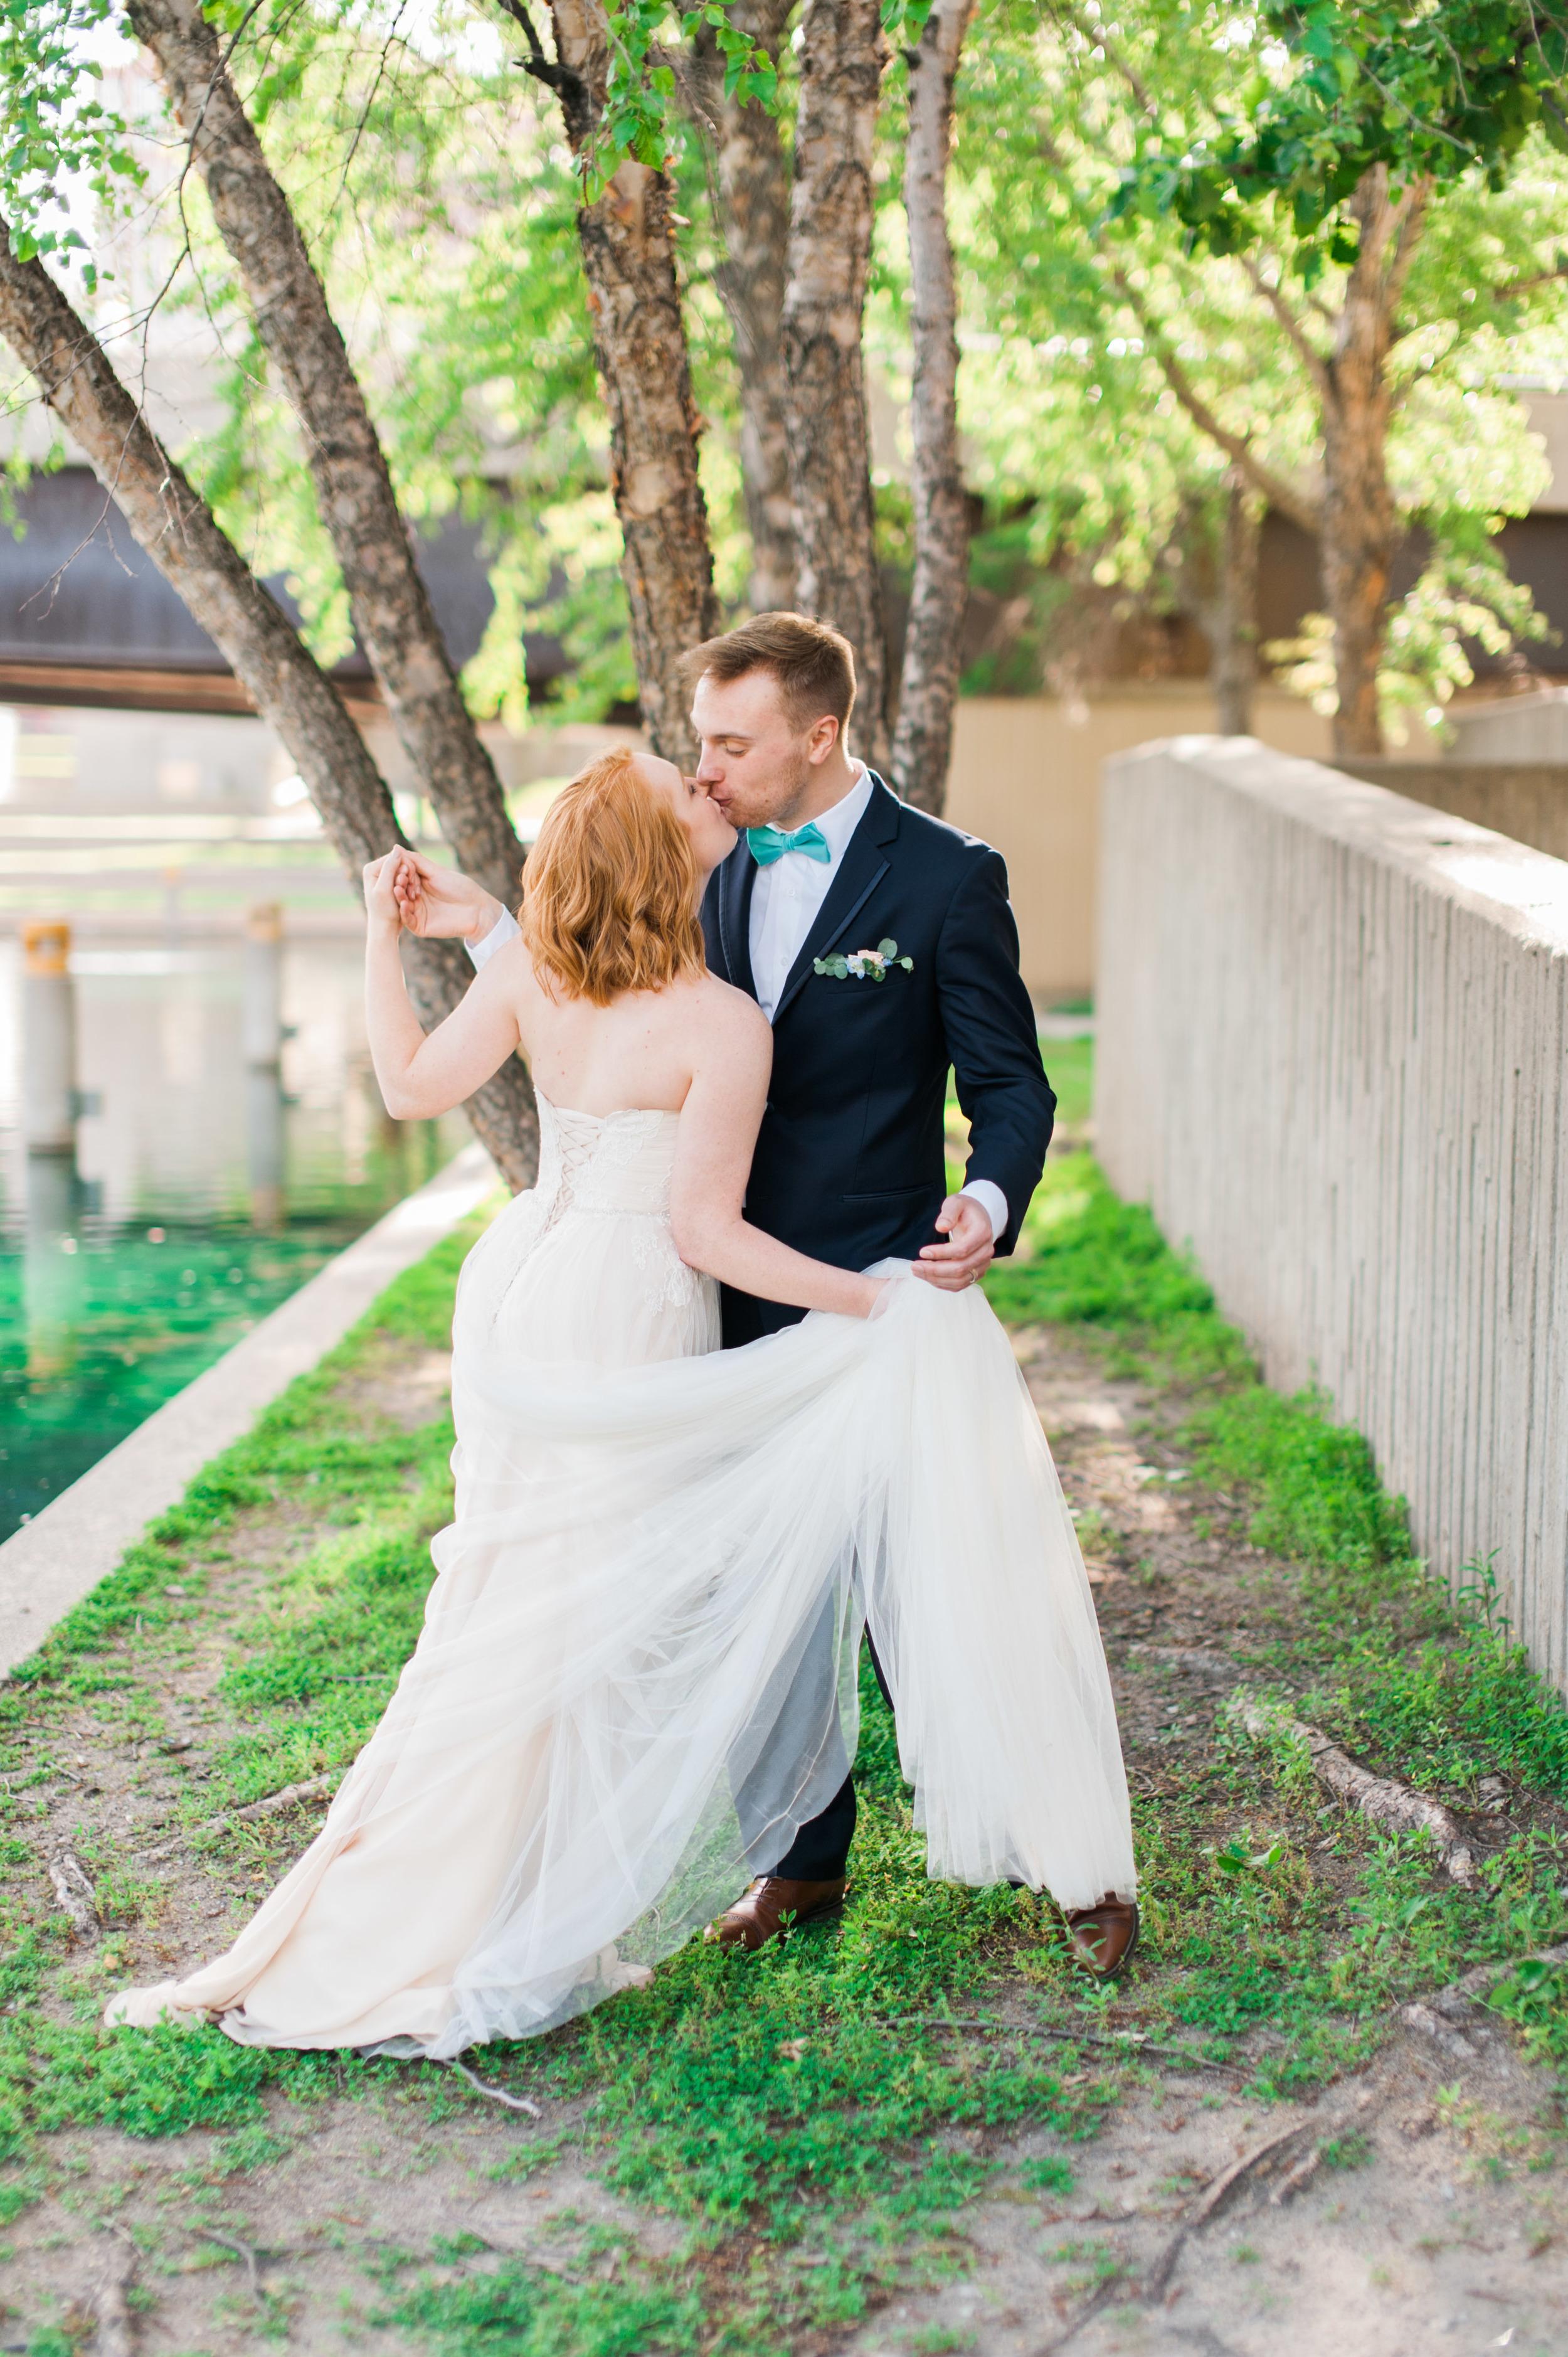 downtown omaha bride and groom wedding photography